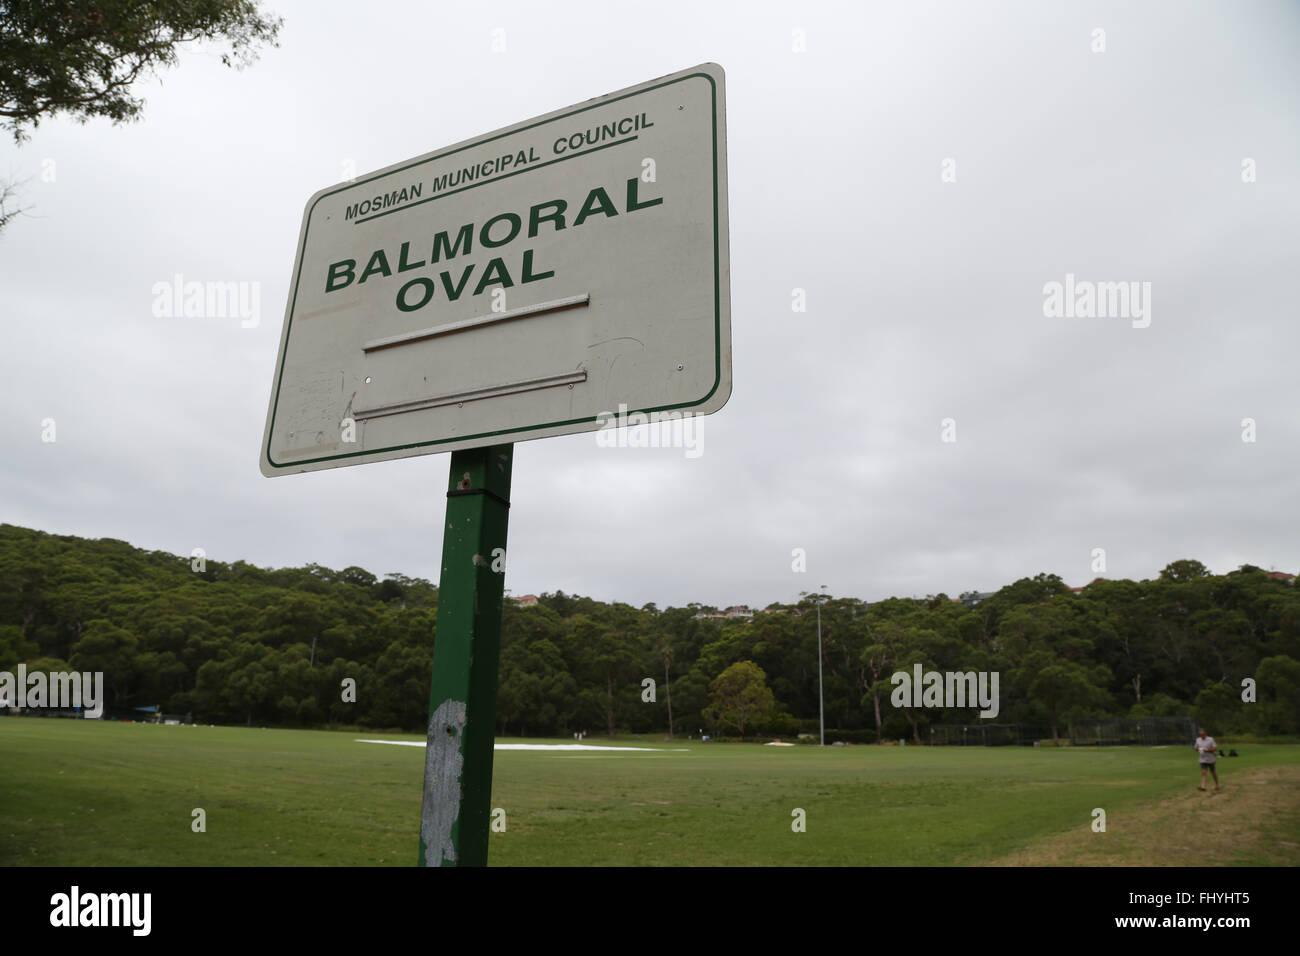 Balmoral Oval in Mosman, Sydney, Australia. - Stock Image